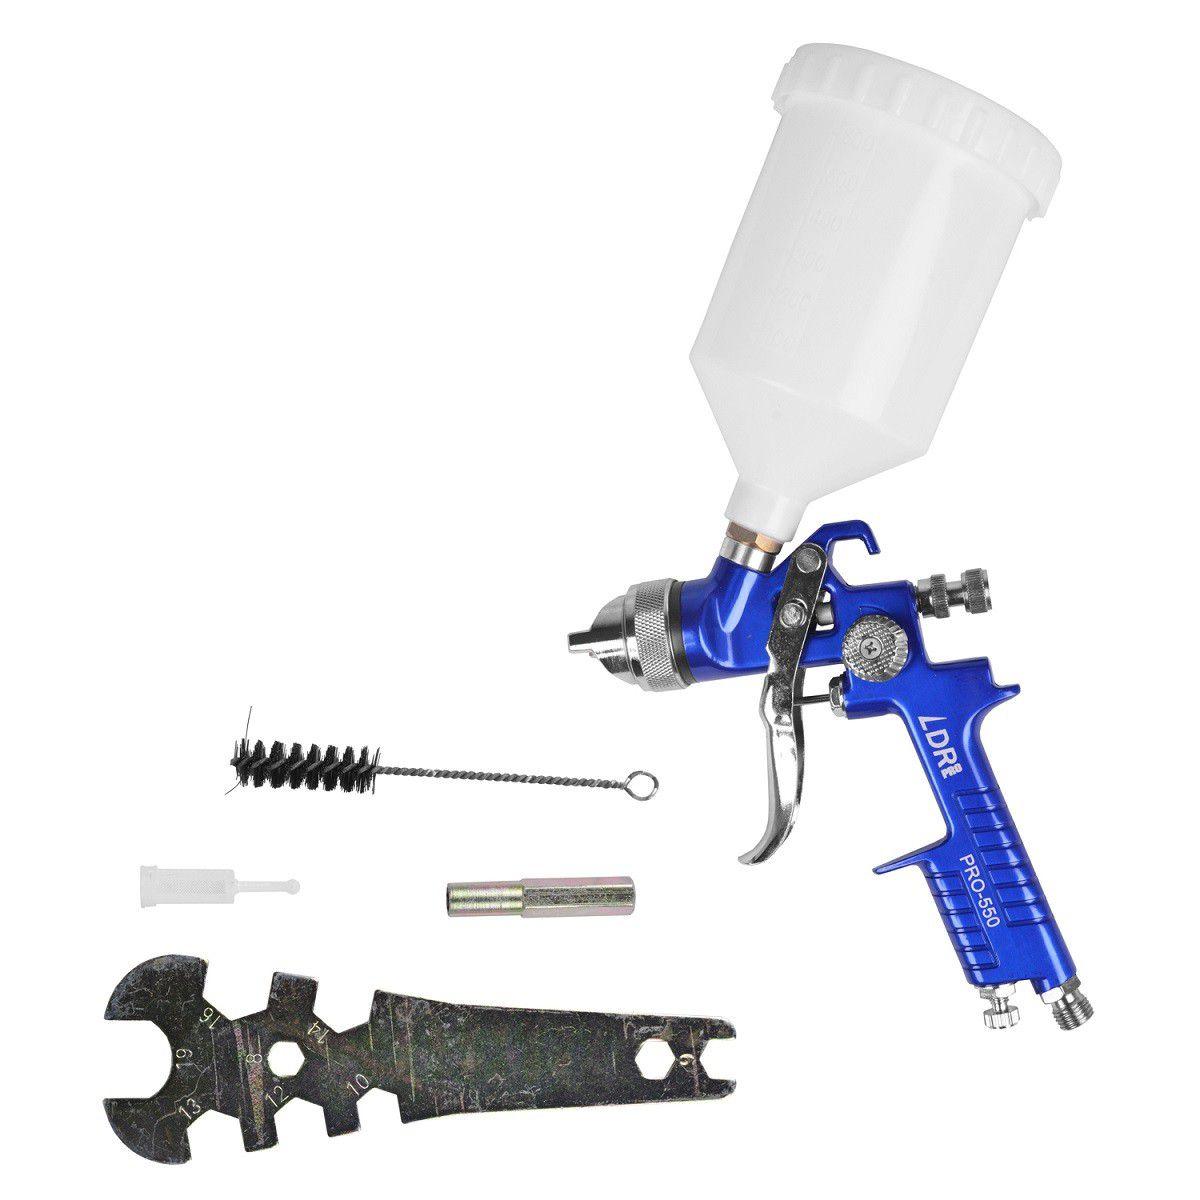 Pistola de Pintura Pro-550 e Lixadeira Roto Orbital